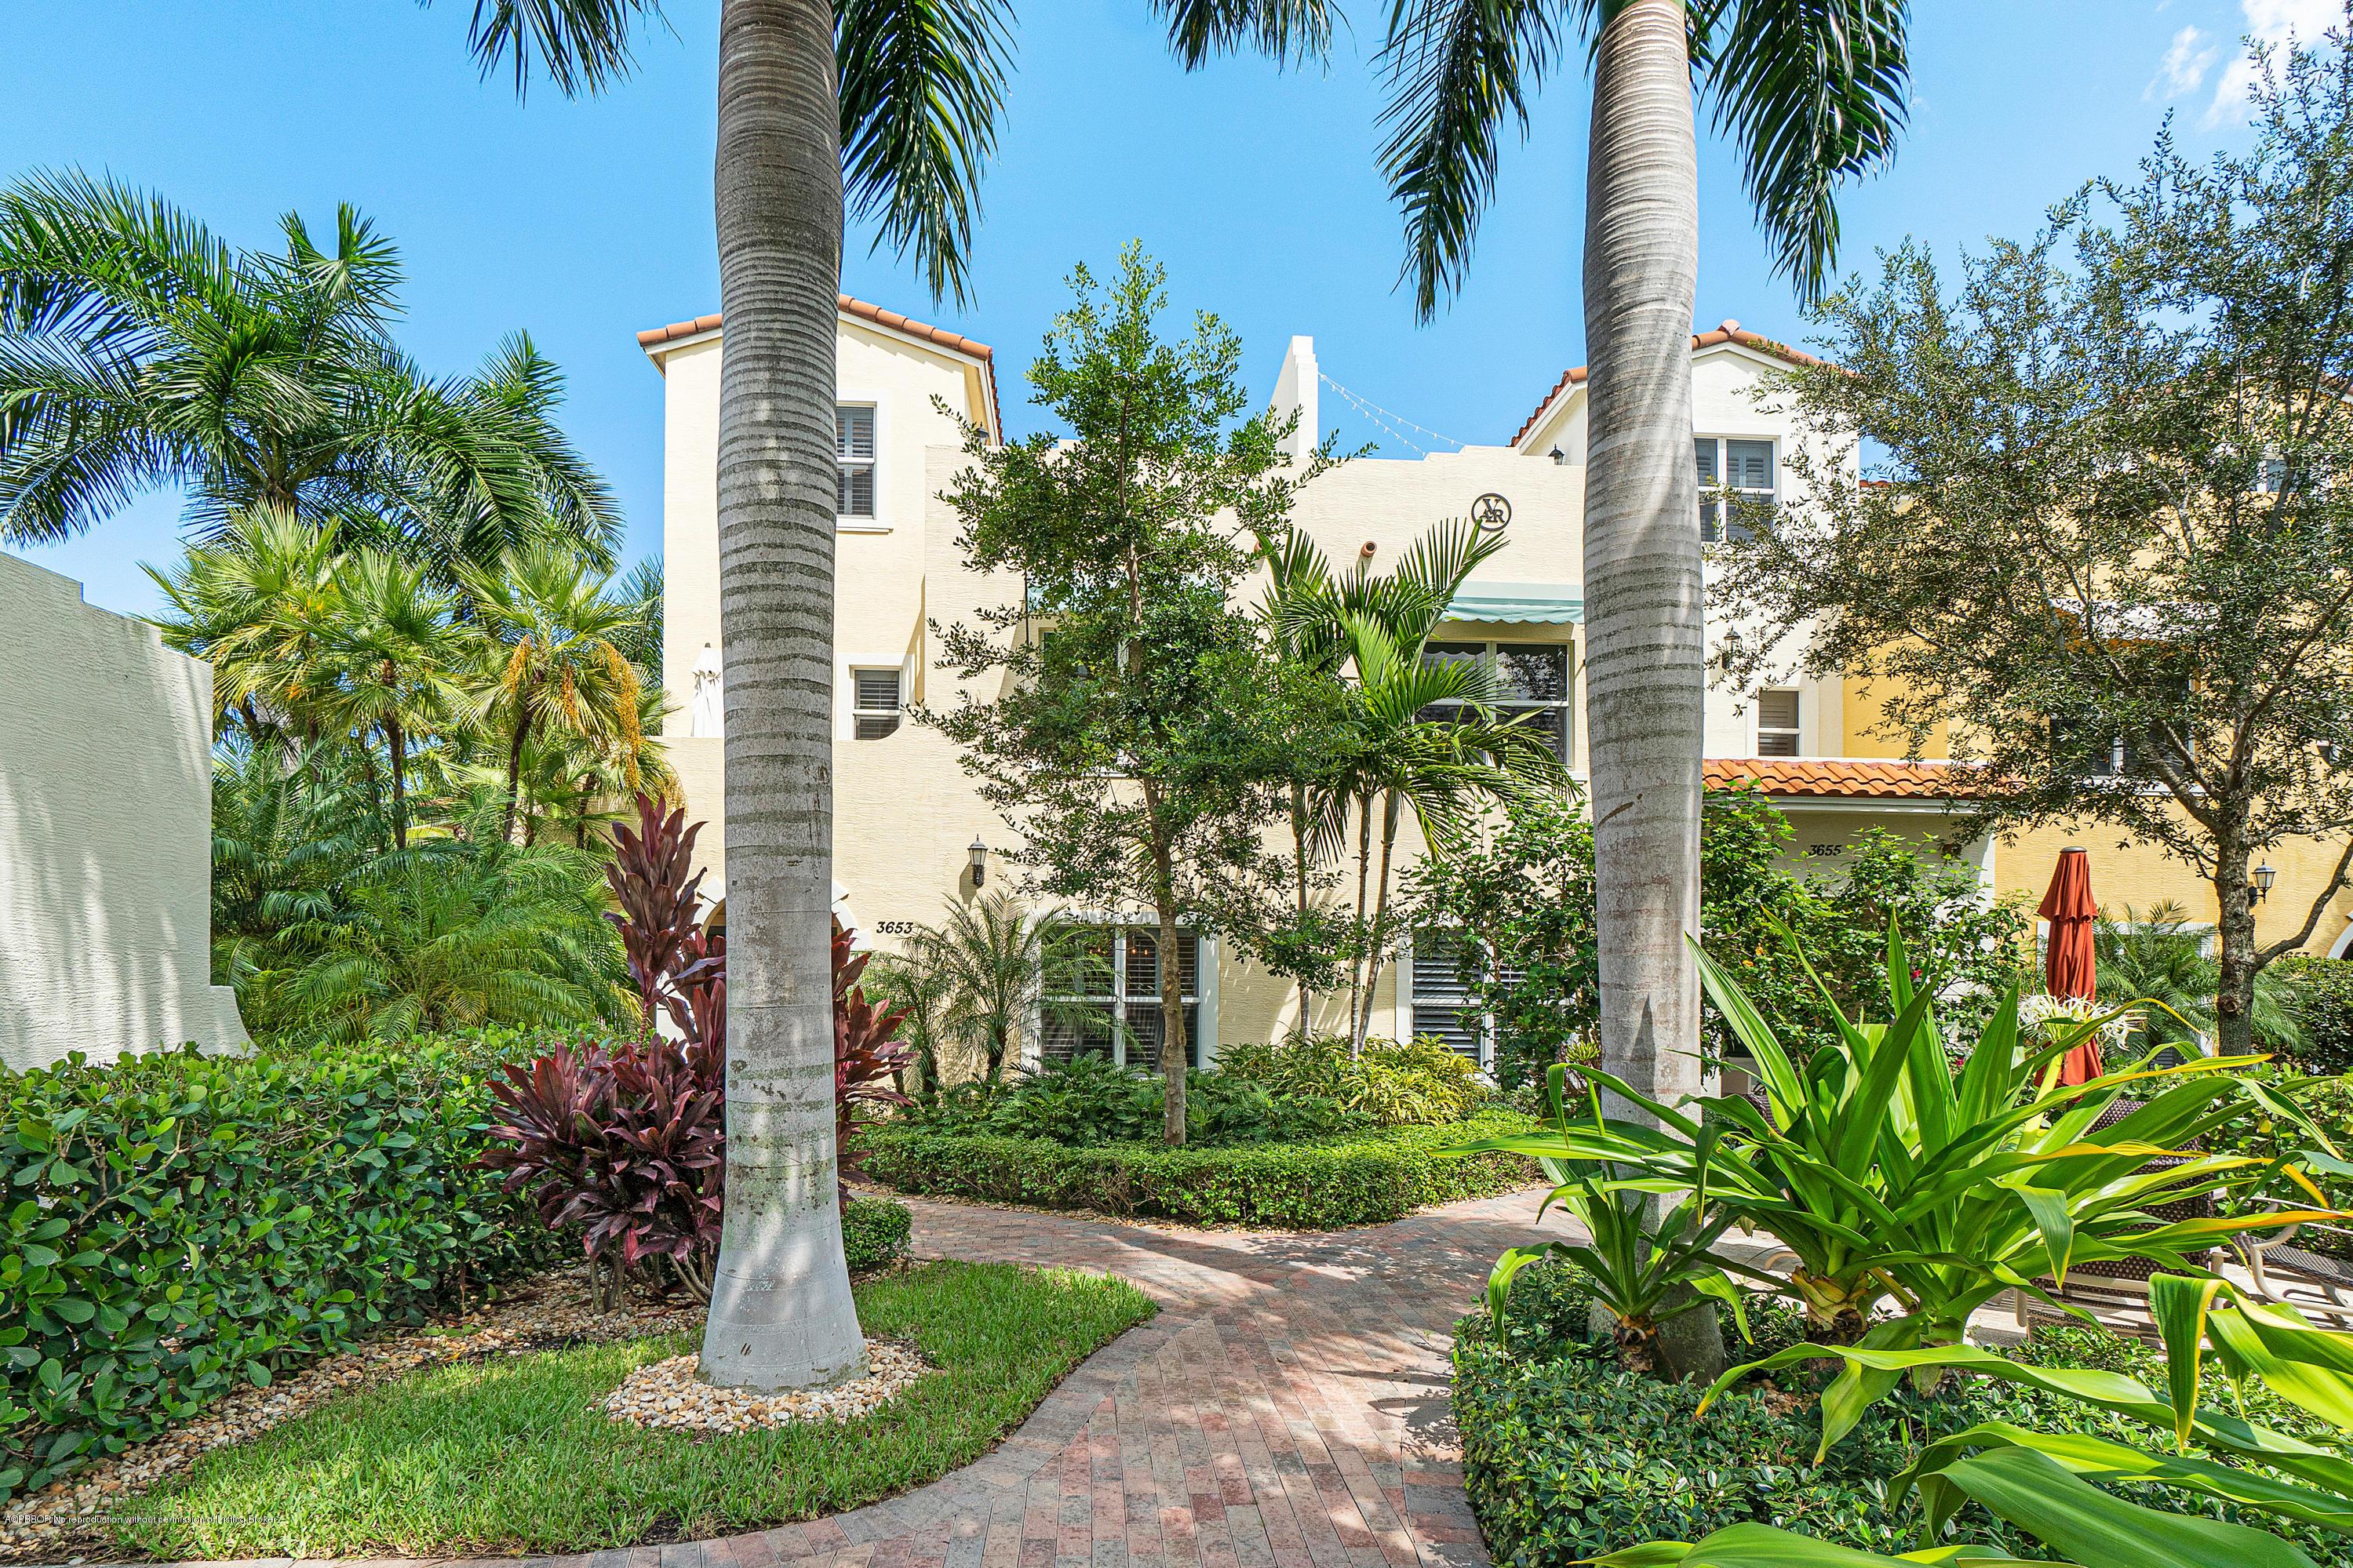 3653 Vintage Way, 19 - West Palm Beach, Florida